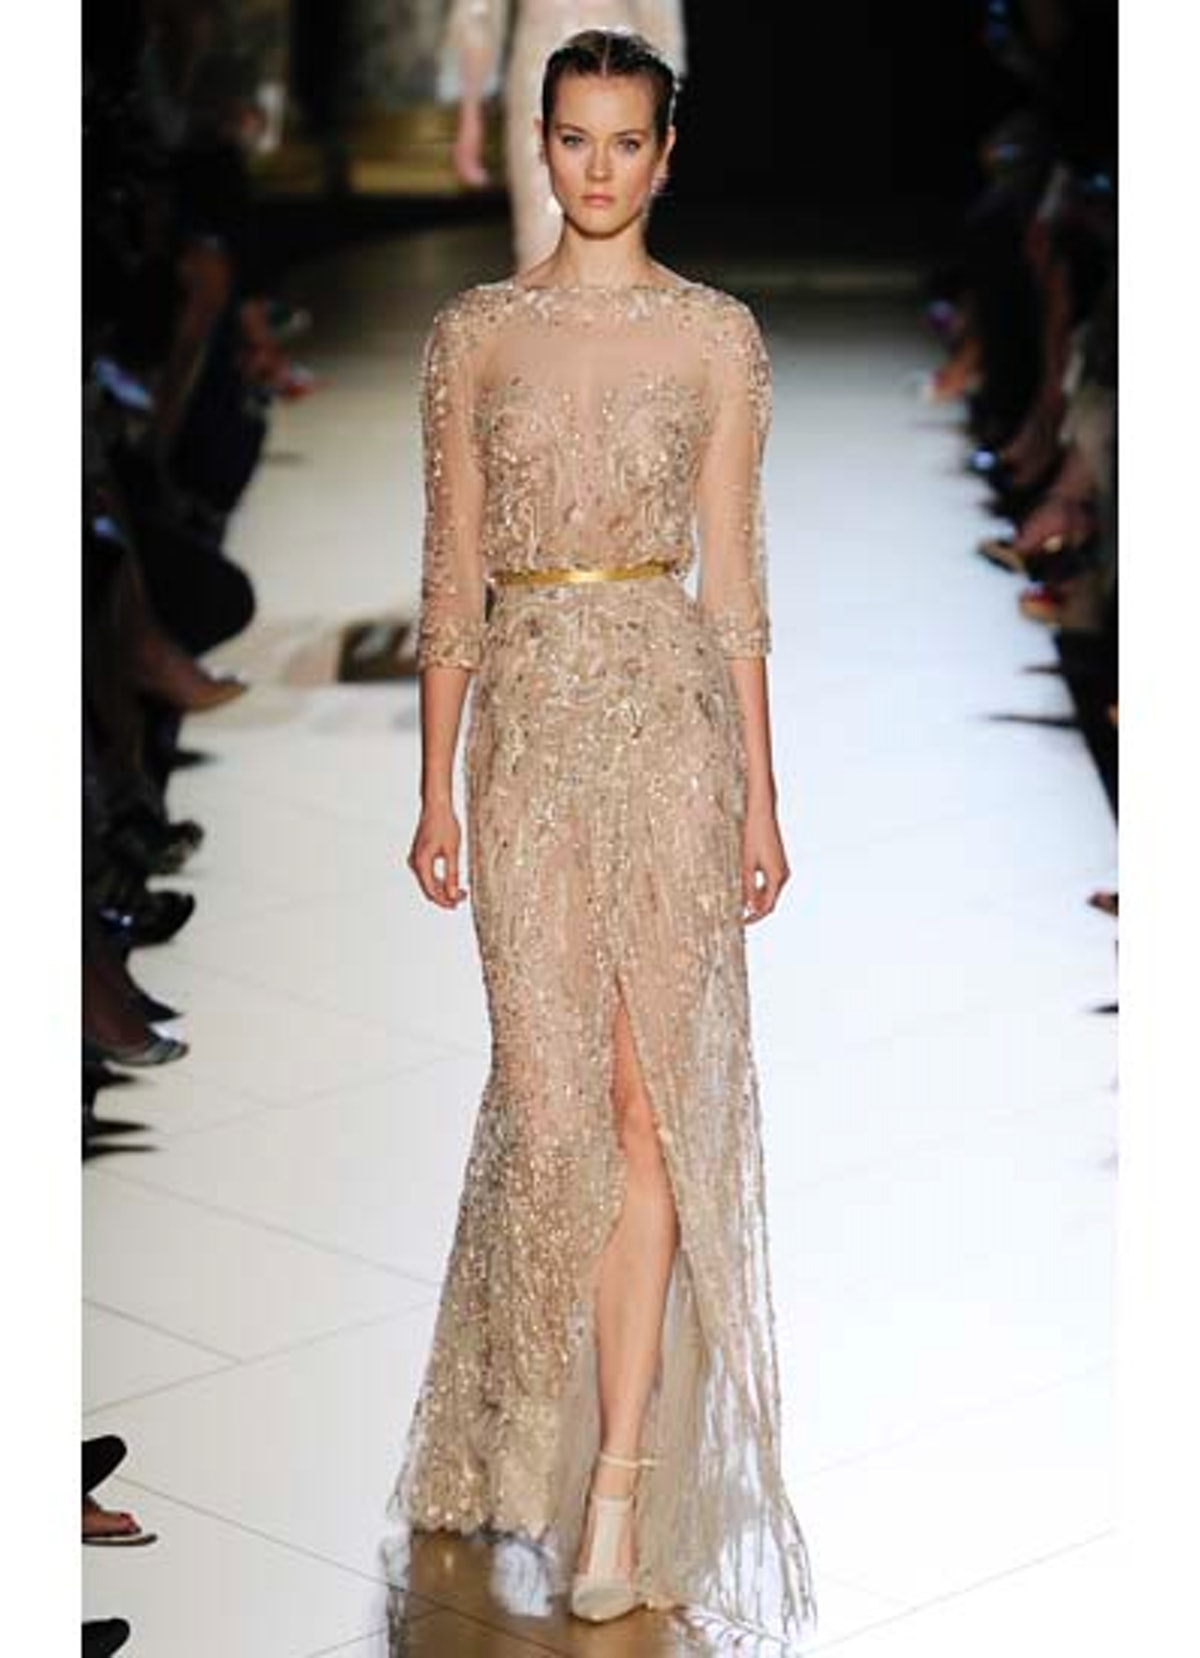 fass-elie-saab-couture-2012-runway-08-v.jpg